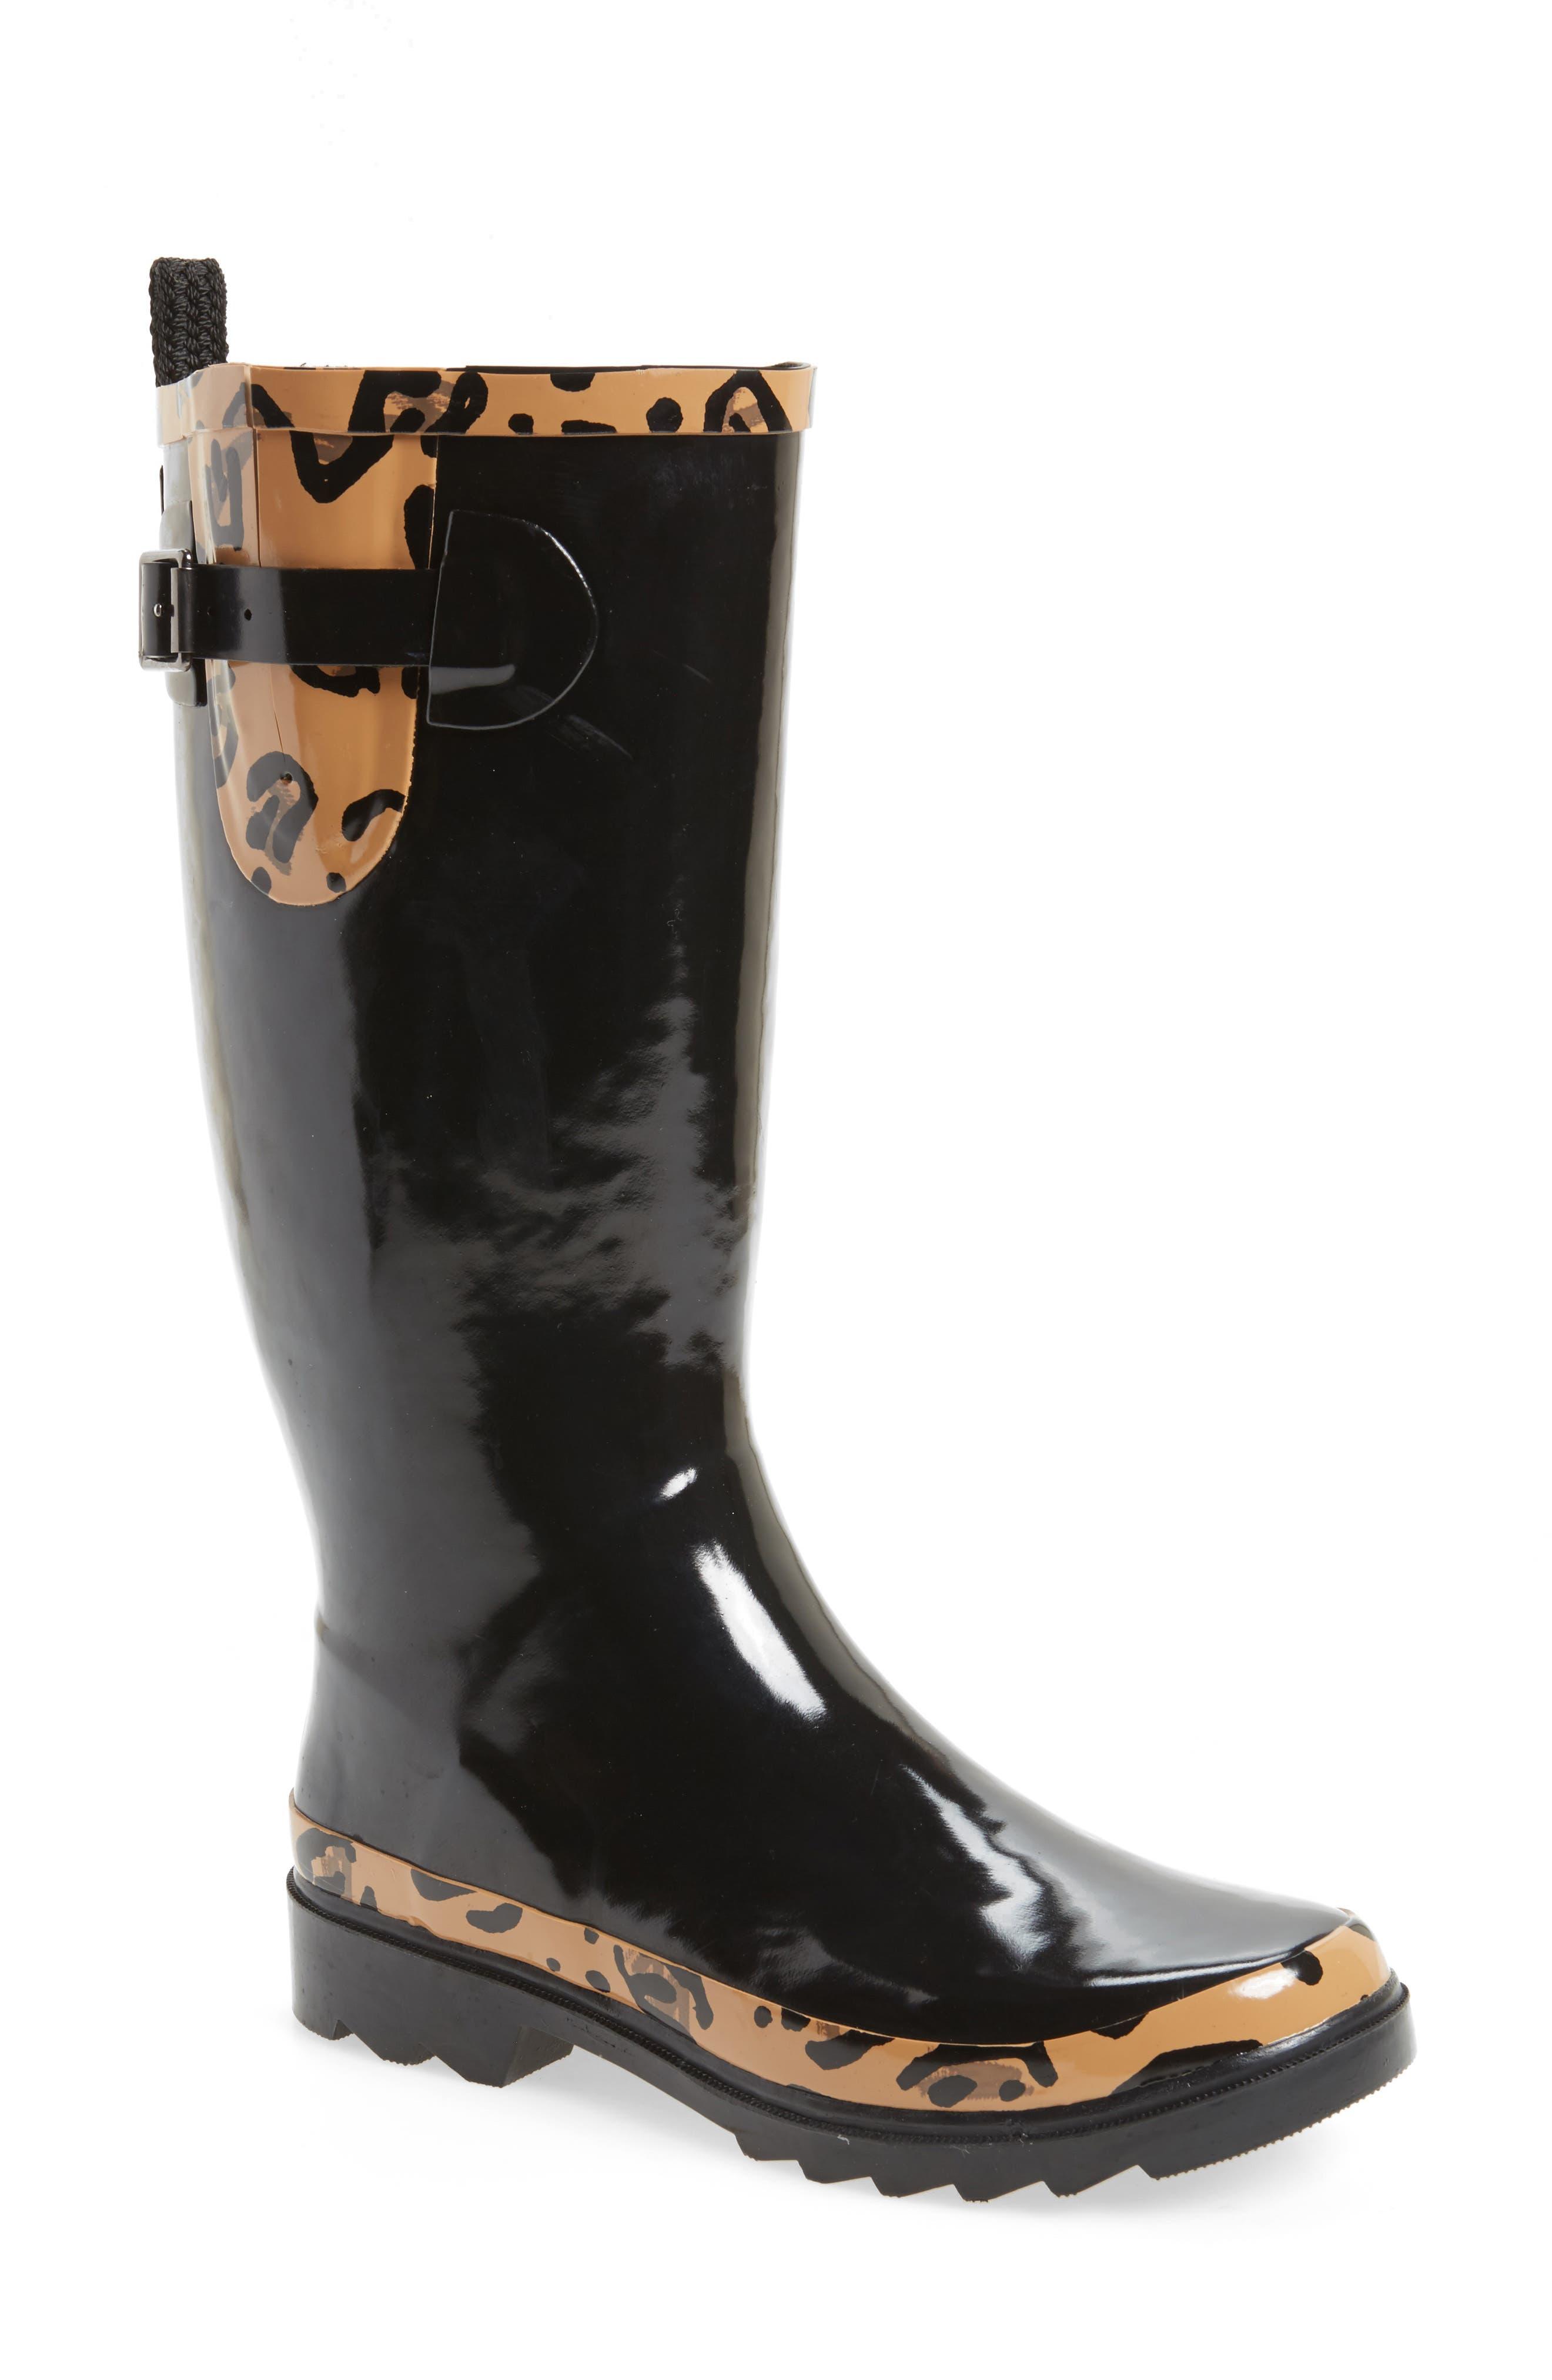 Alternate Image 1 Selected - Sakroots 'Rhythm' Waterproof Rain Boot (Women)